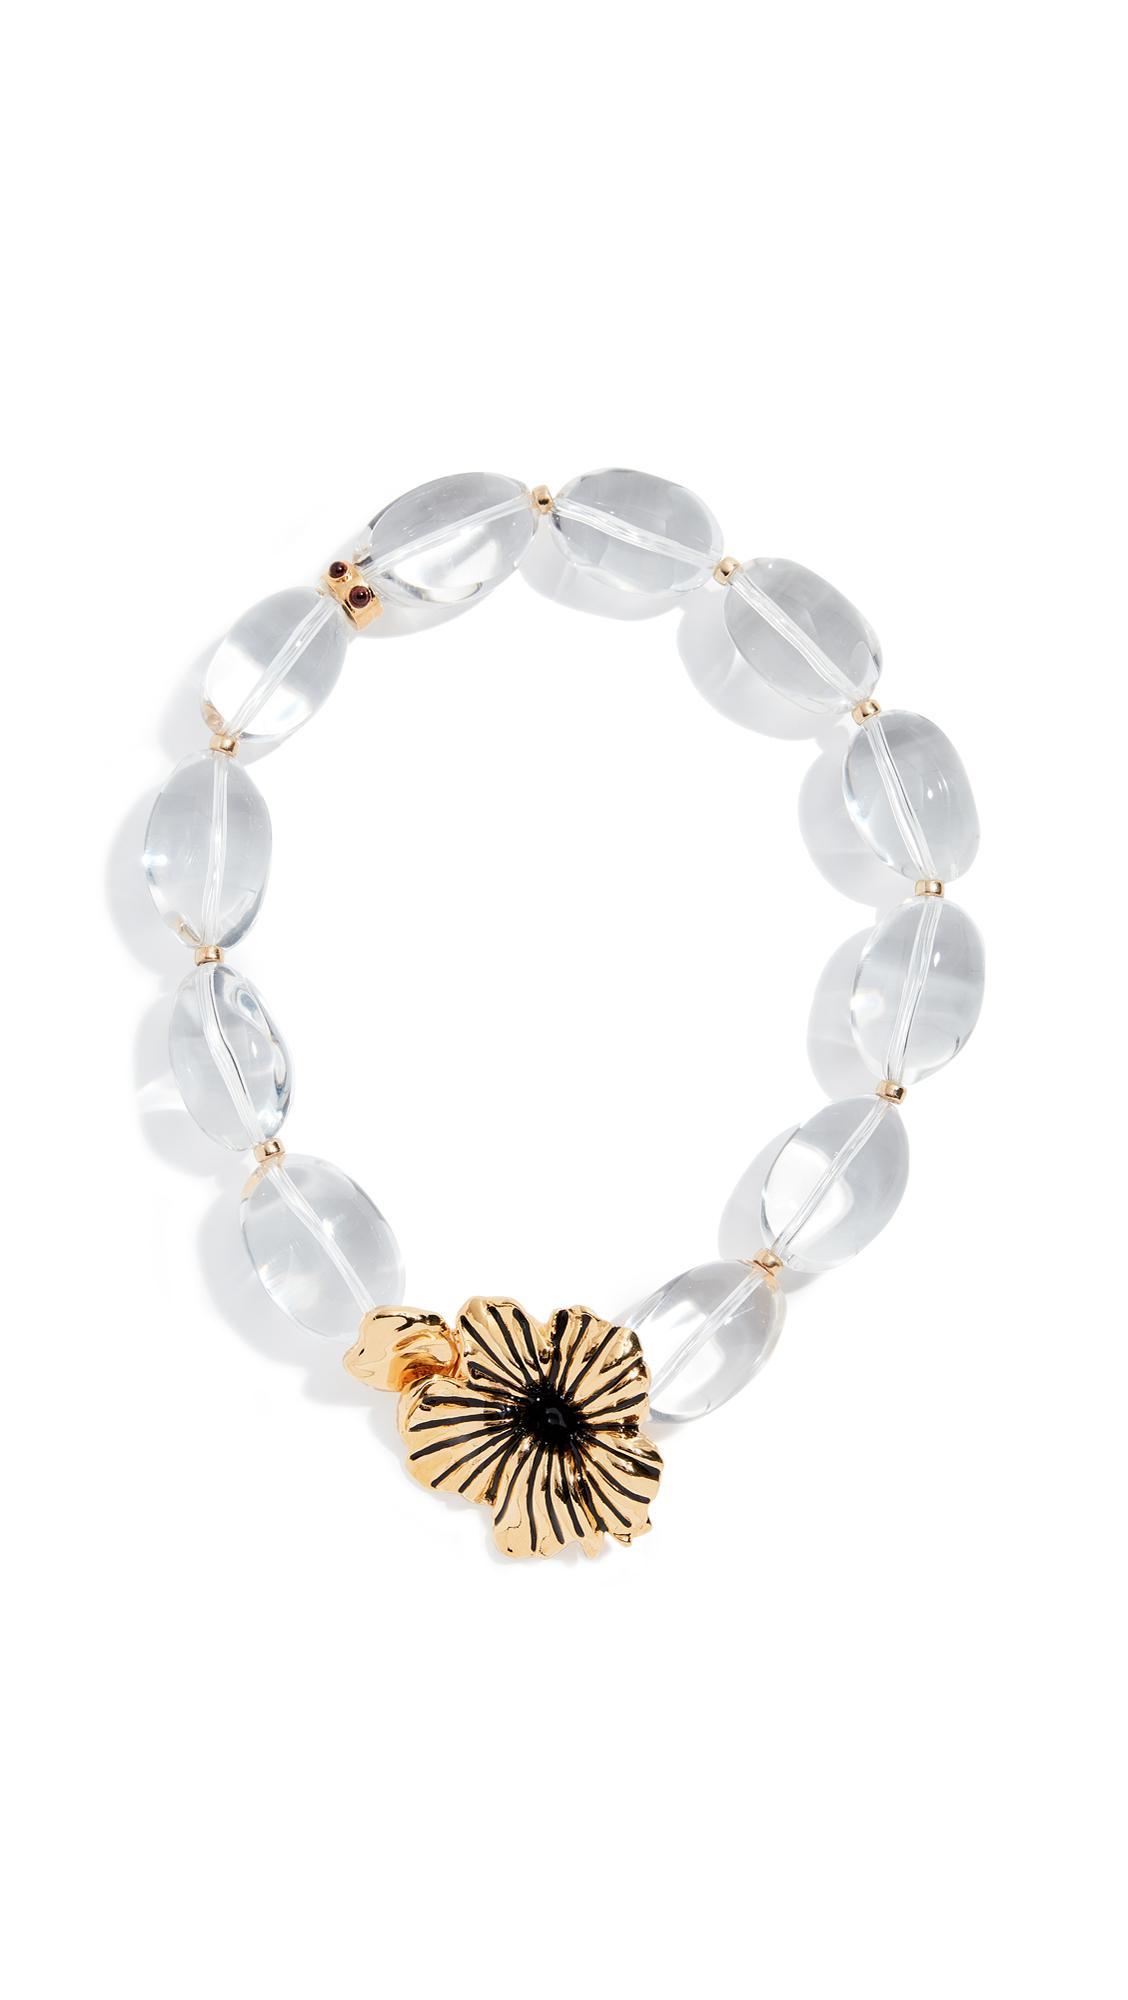 Lizzie Fortunato Brindisi Collar Necklace In Clear/Brass